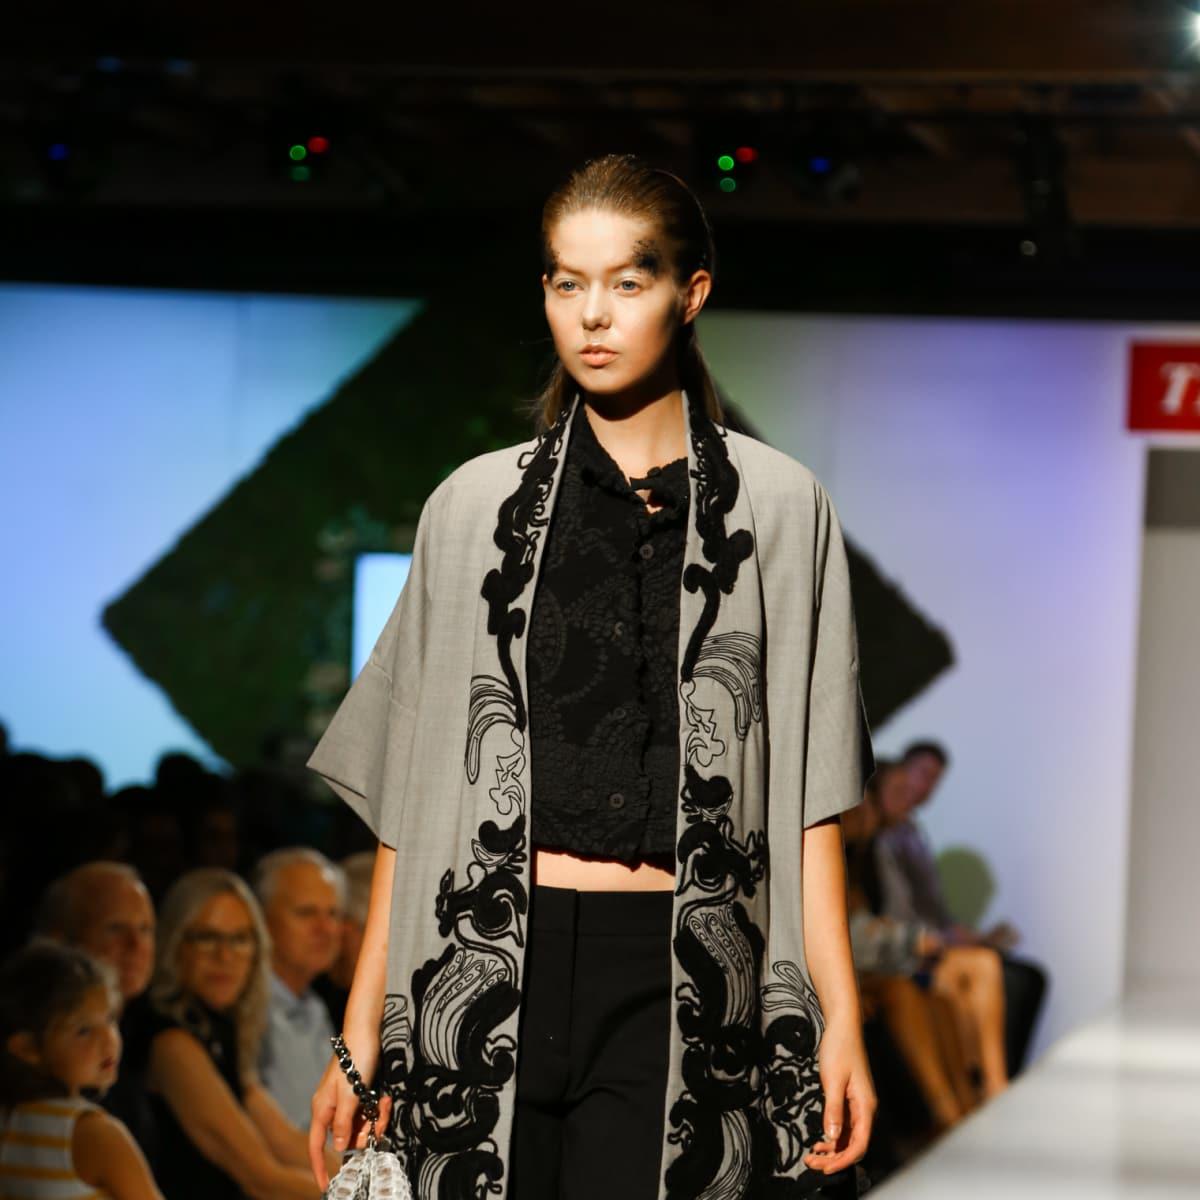 Tribeza Fashion Show 2015 at Brazos Hall The Garden Room